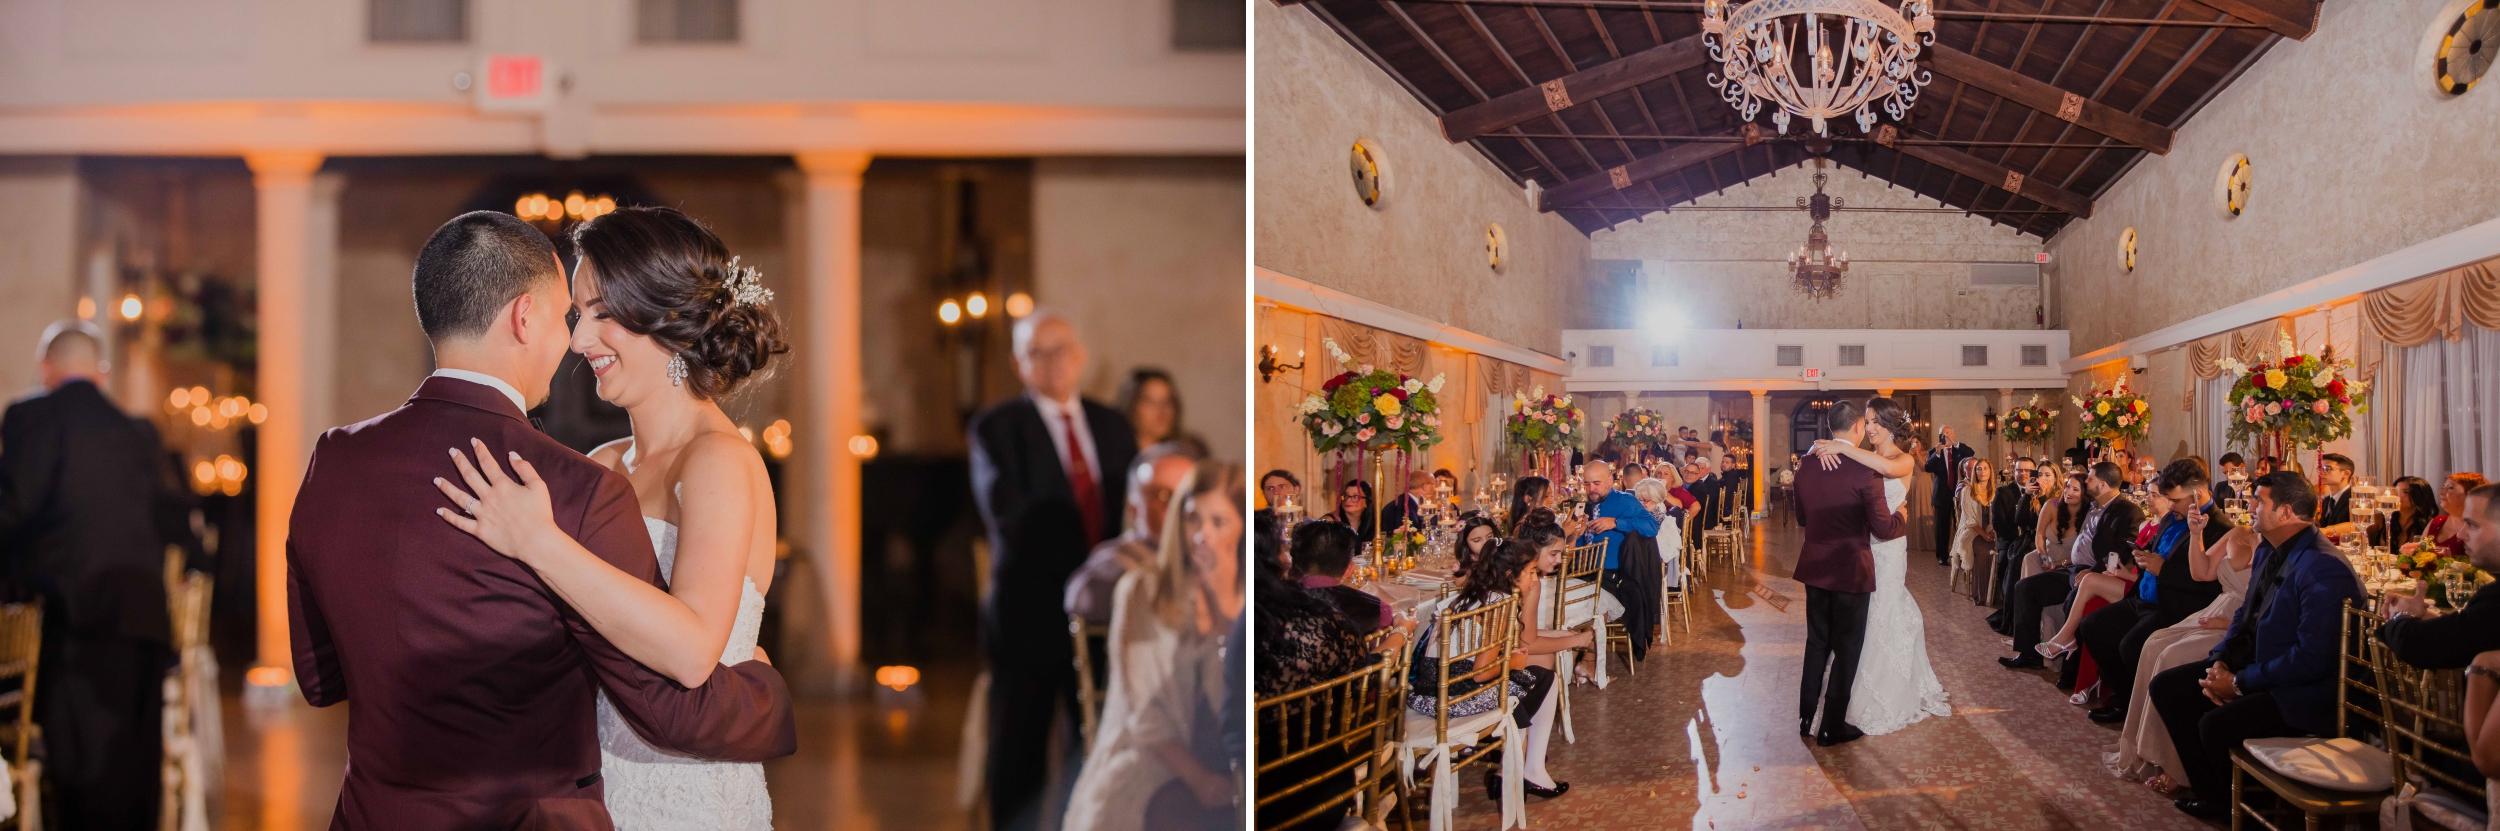 Wedding - Coco Plum - Coral Gables Congregational - Santy Martinez Photography 32.jpg